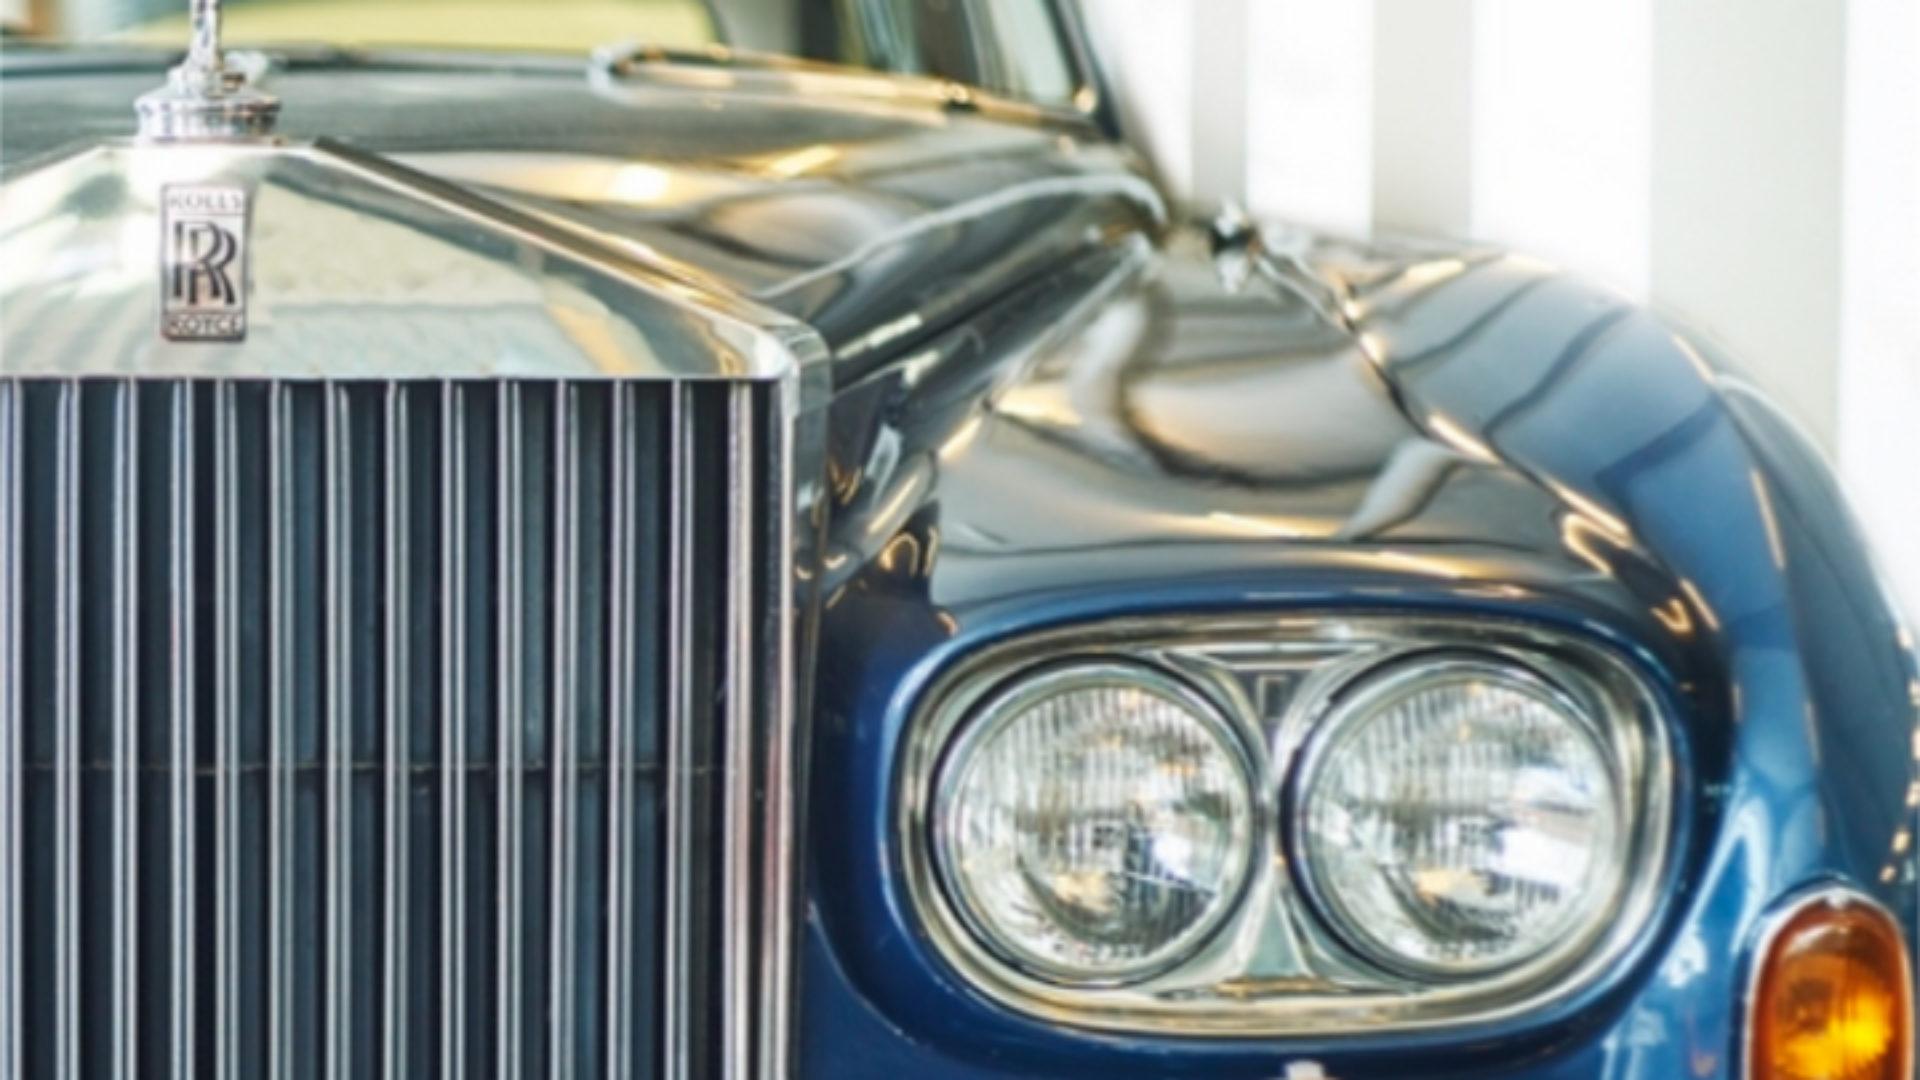 Rolls-Royce Automobilmuseum, Dornbirn